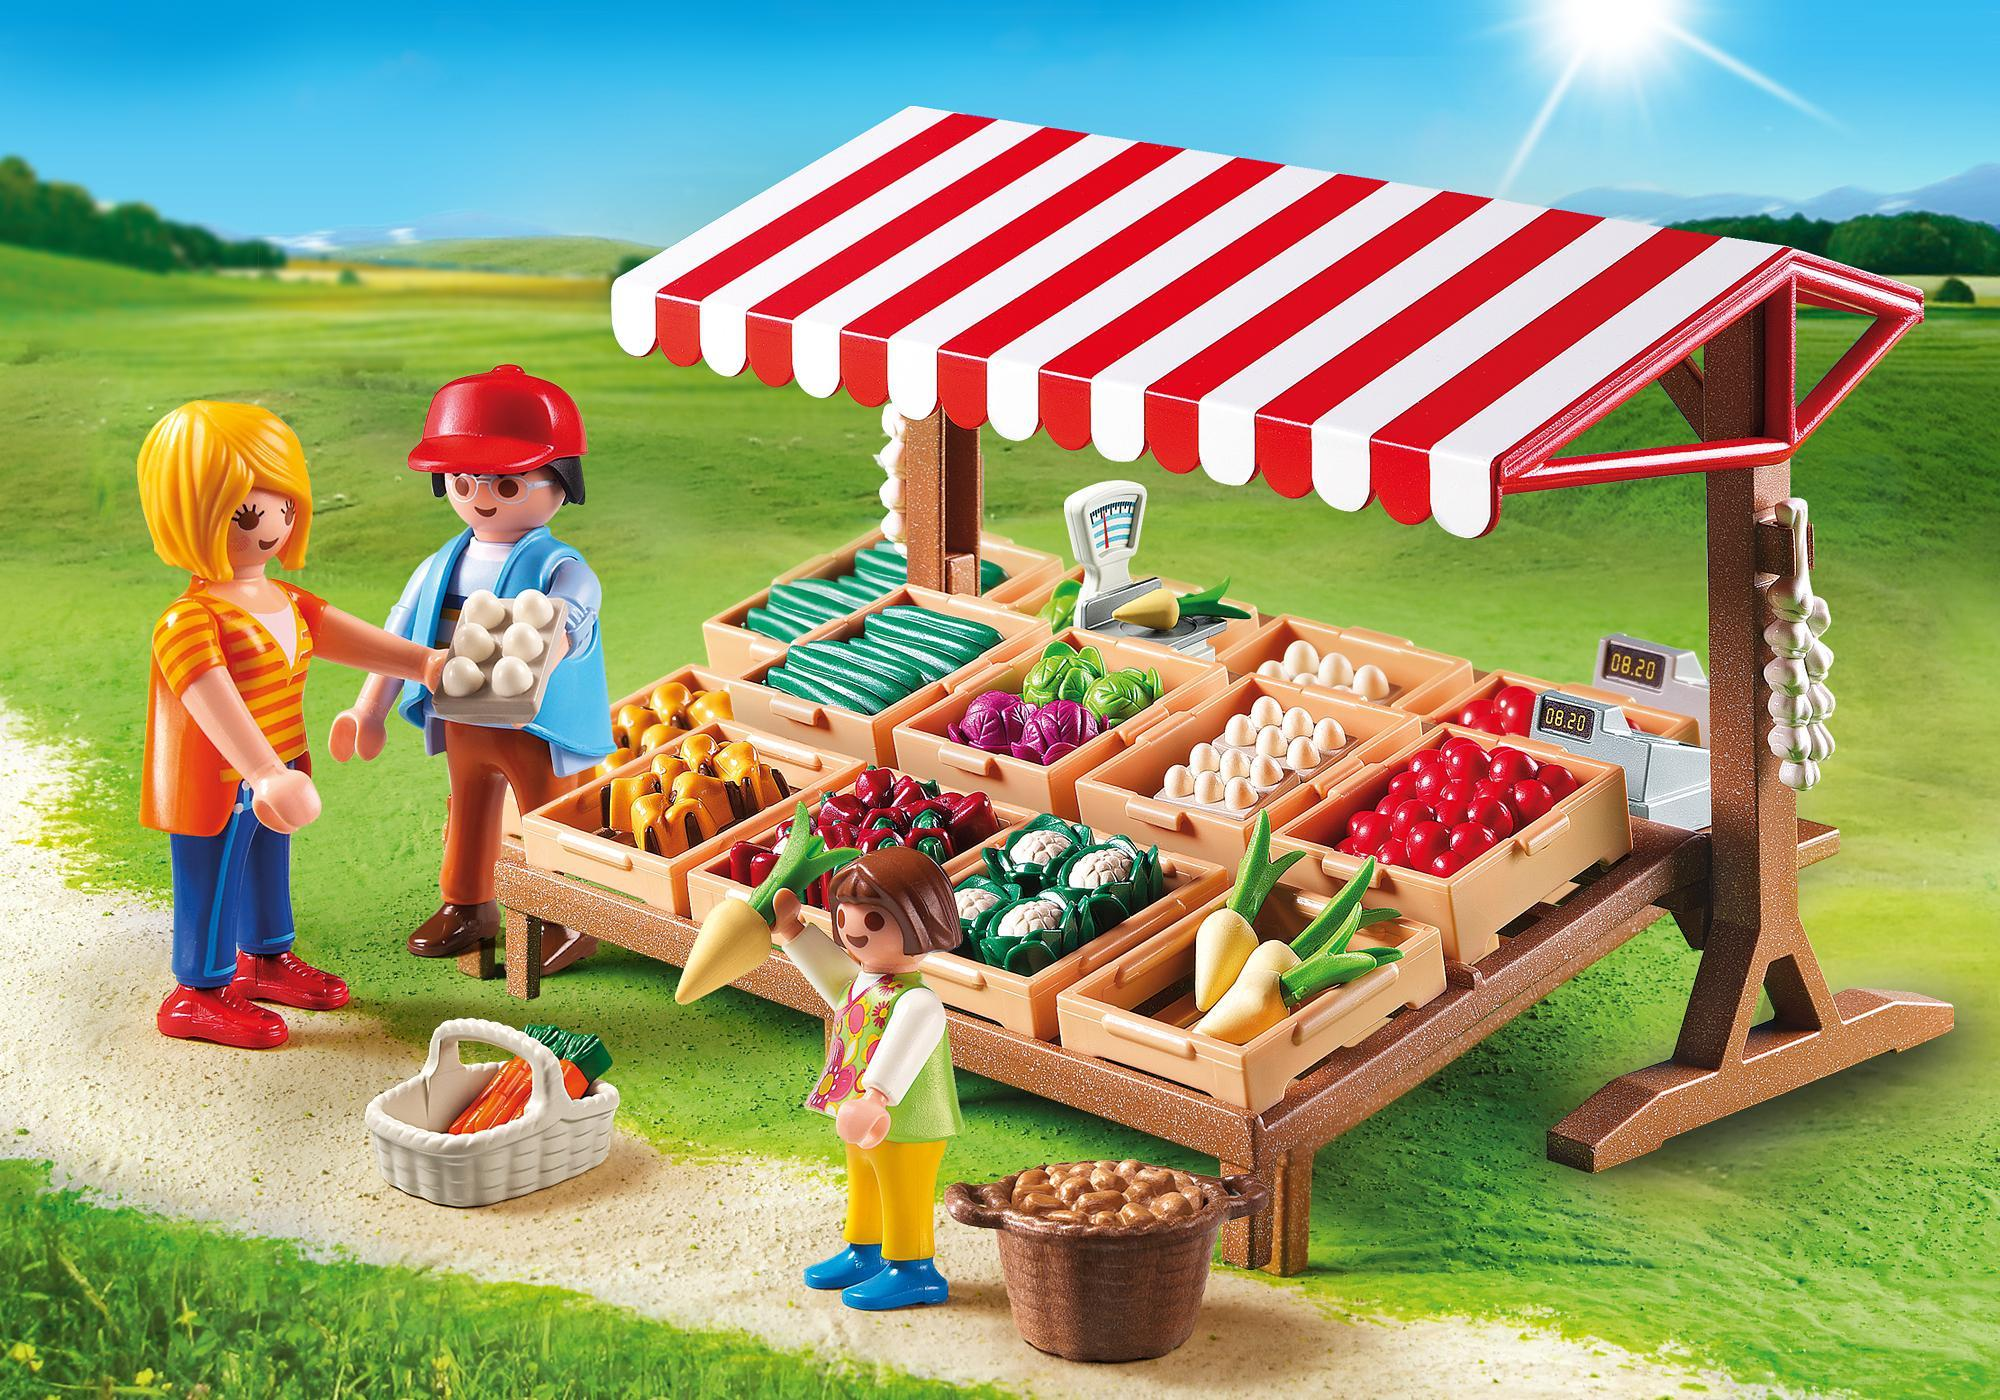 http://media.playmobil.com/i/playmobil/6121_product_detail/Farmer's Market